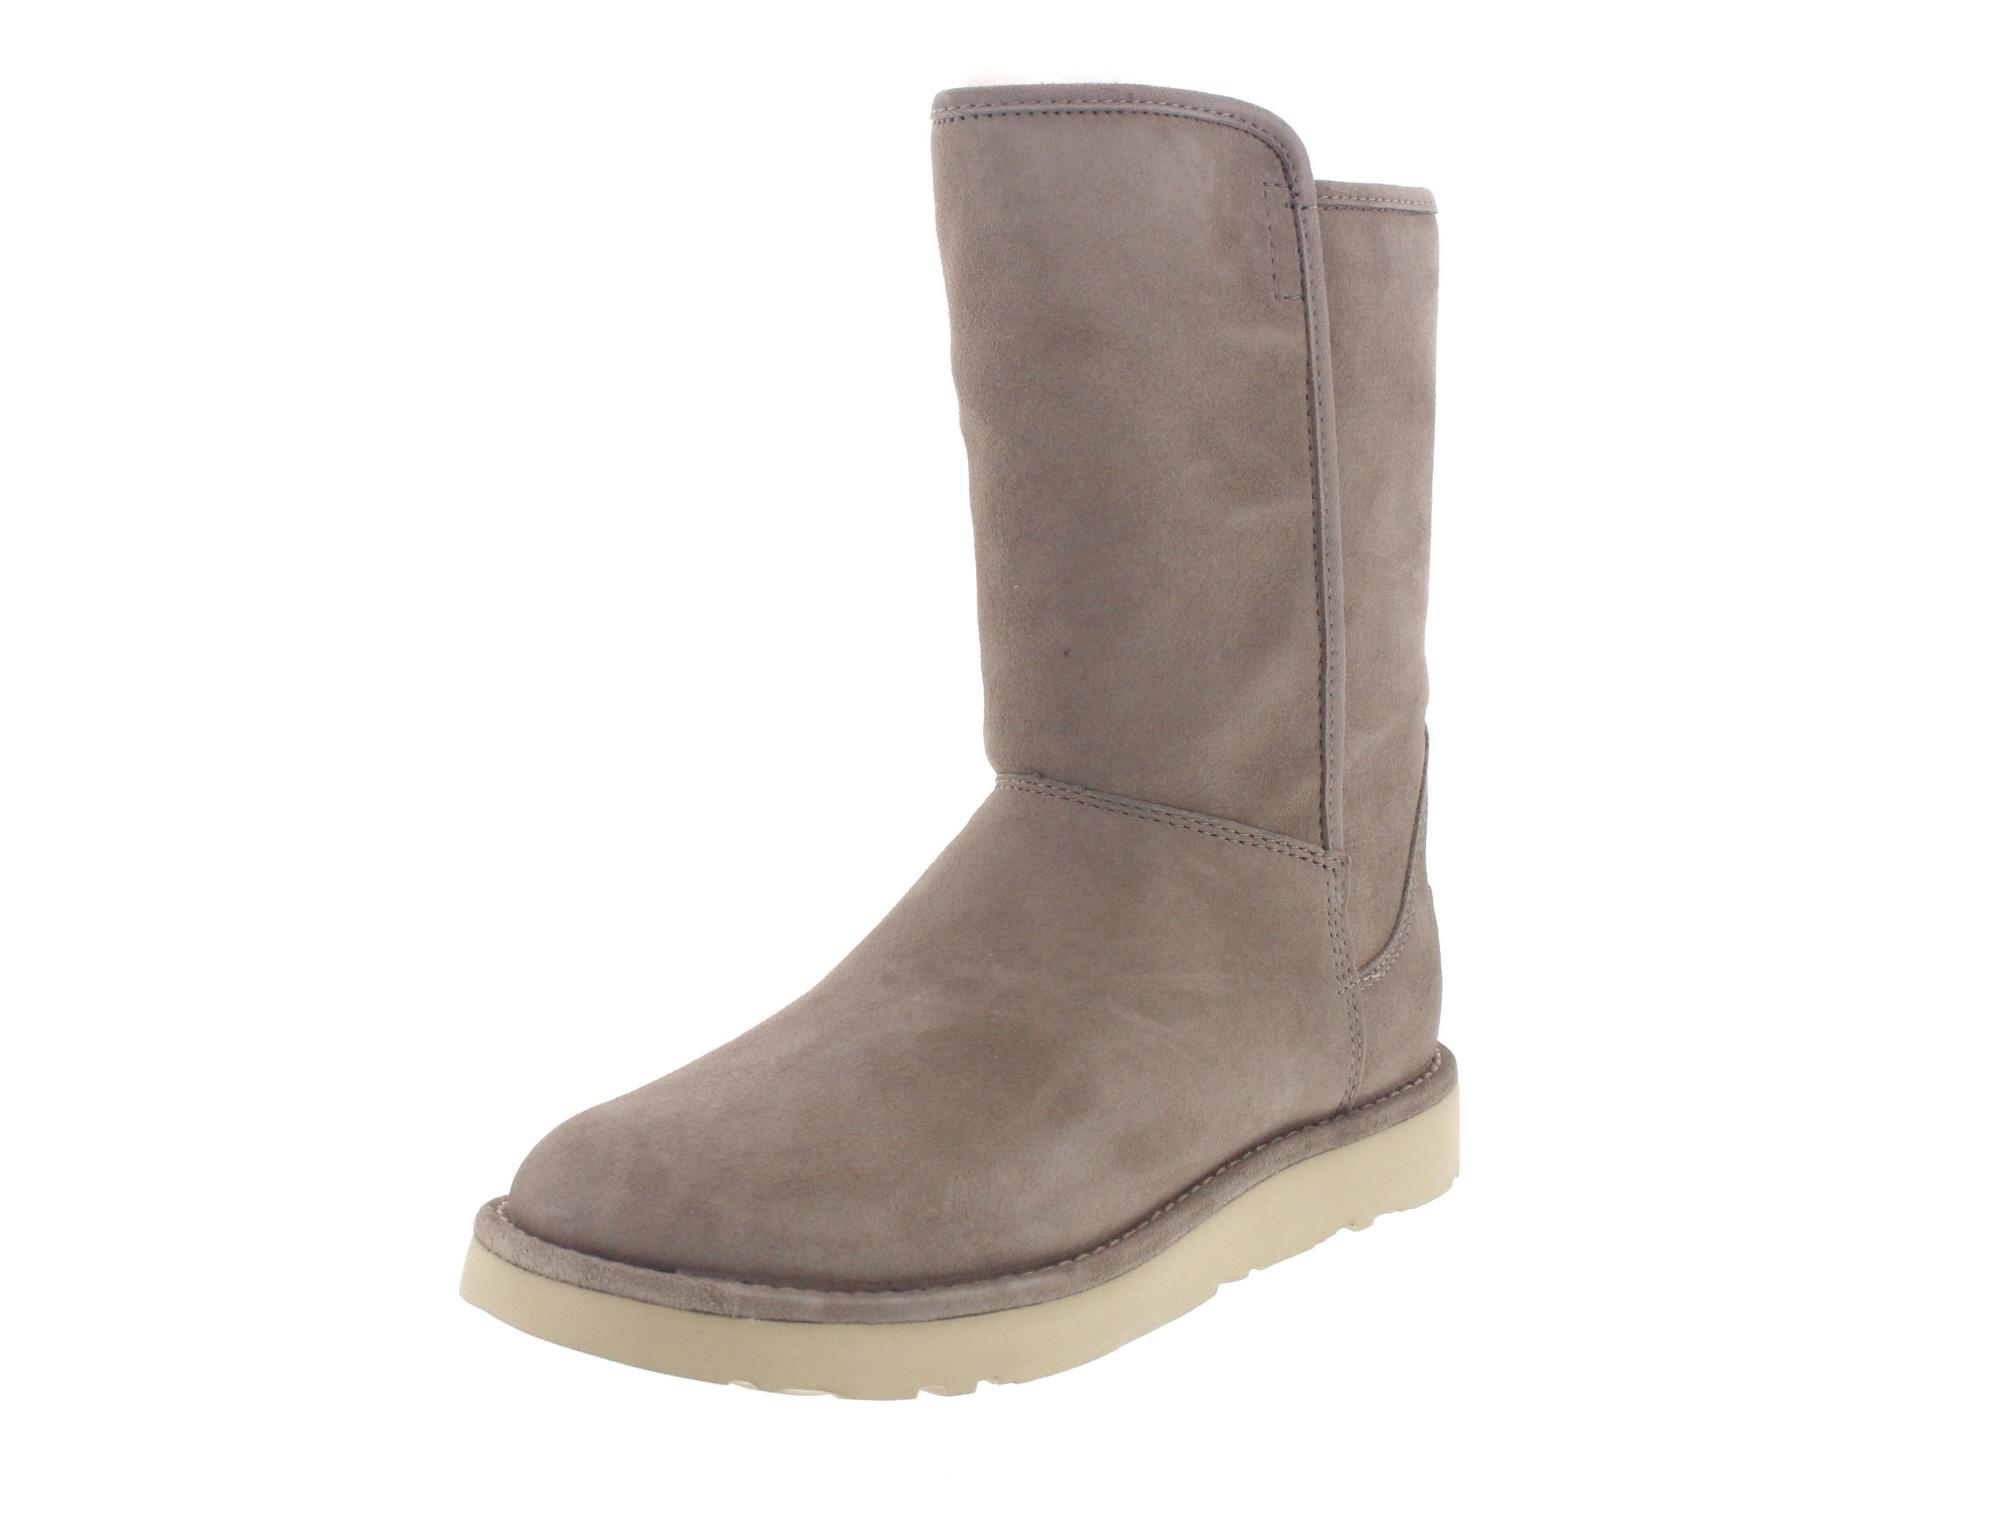 UGG Damen - Stiefelette ABREE SHORT II 1016589 - clay-0